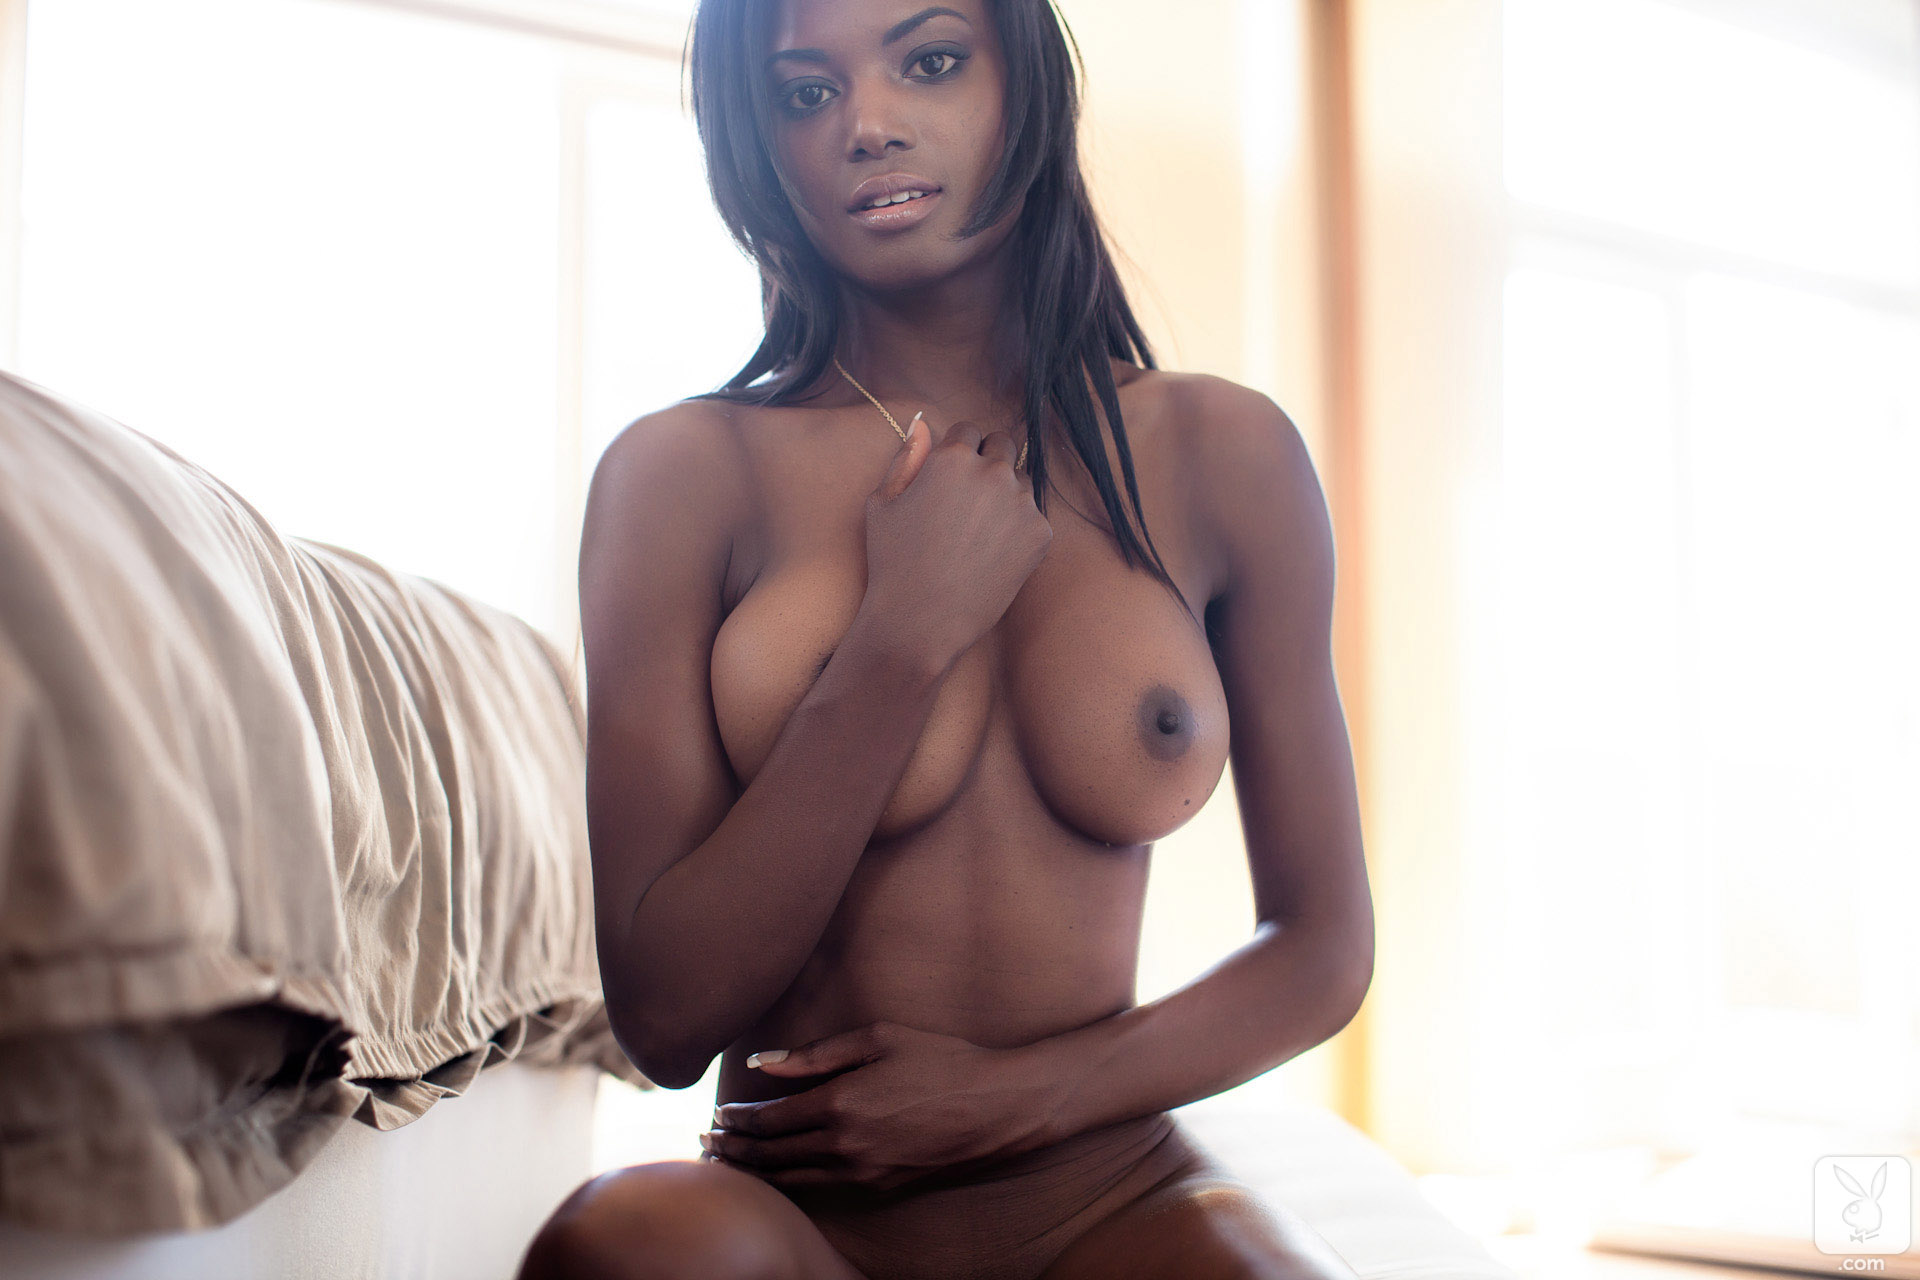 danielle-nicole-naked-ebony-rooftop-honey-bikini-playboy-26